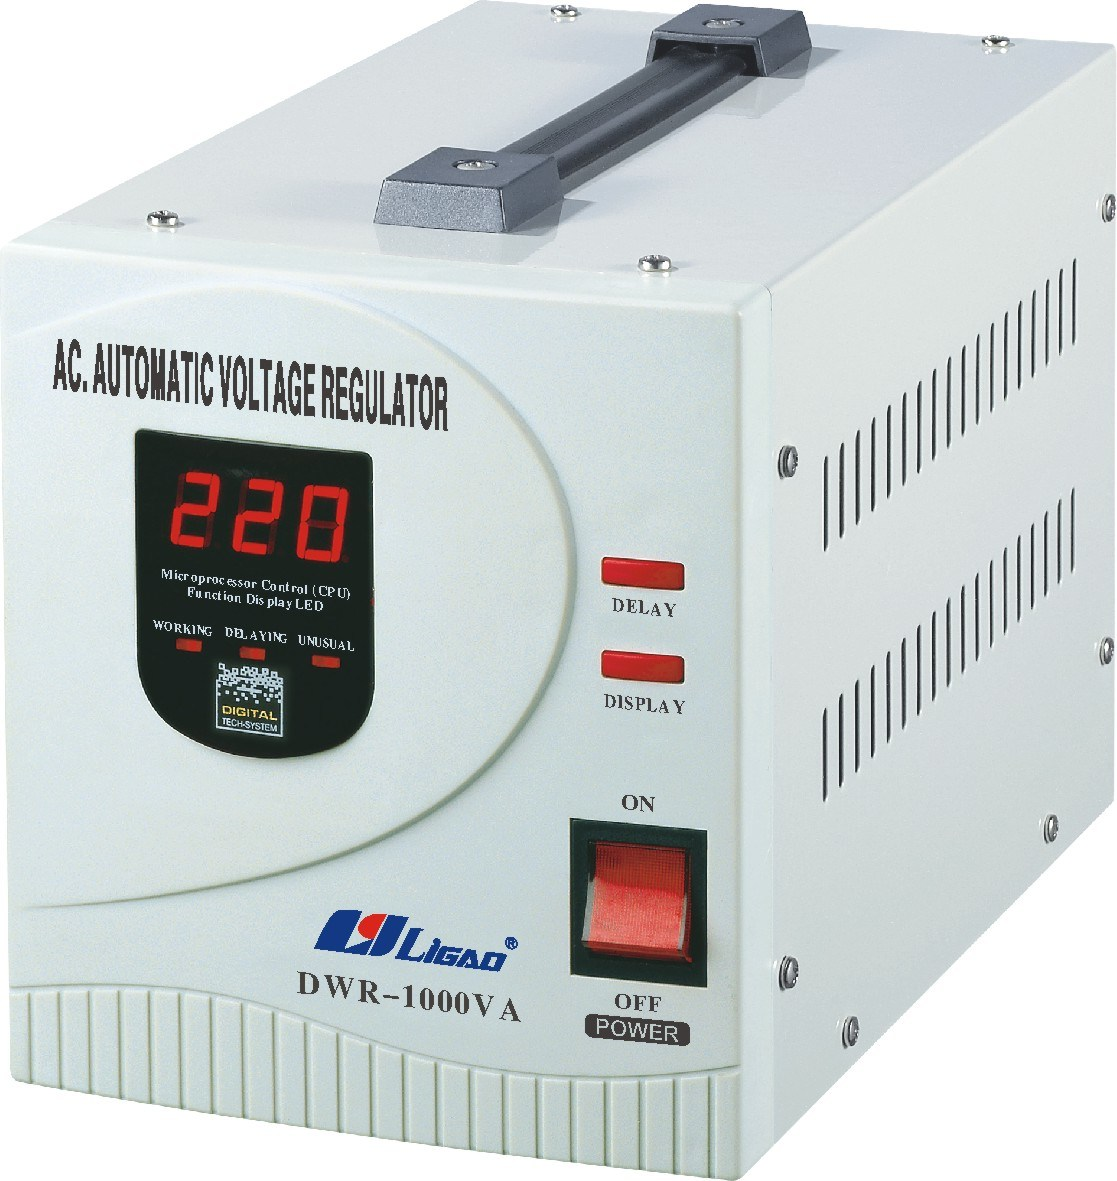 China Automatic Voltage Regulator Dwr 1000va China